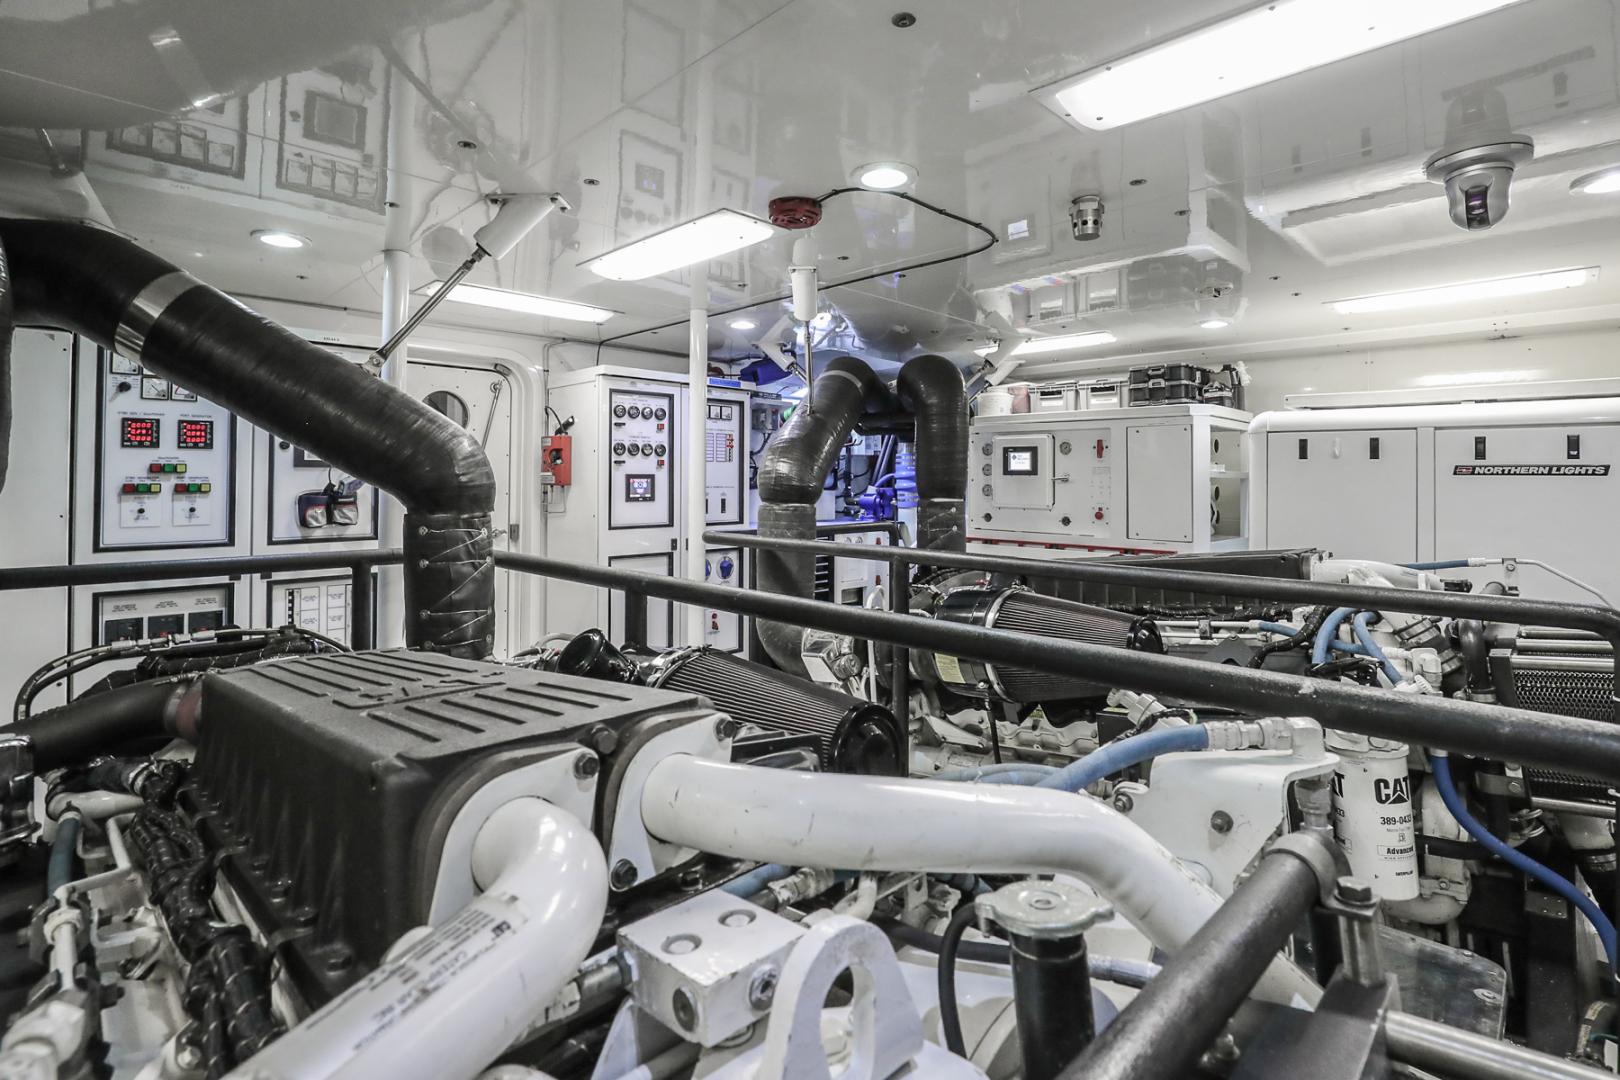 Northcoast-NC125 2011-FUGITIVE *Name Reserved* West Palm Beach-Florida-United States-Engine Room-1513501 | Thumbnail